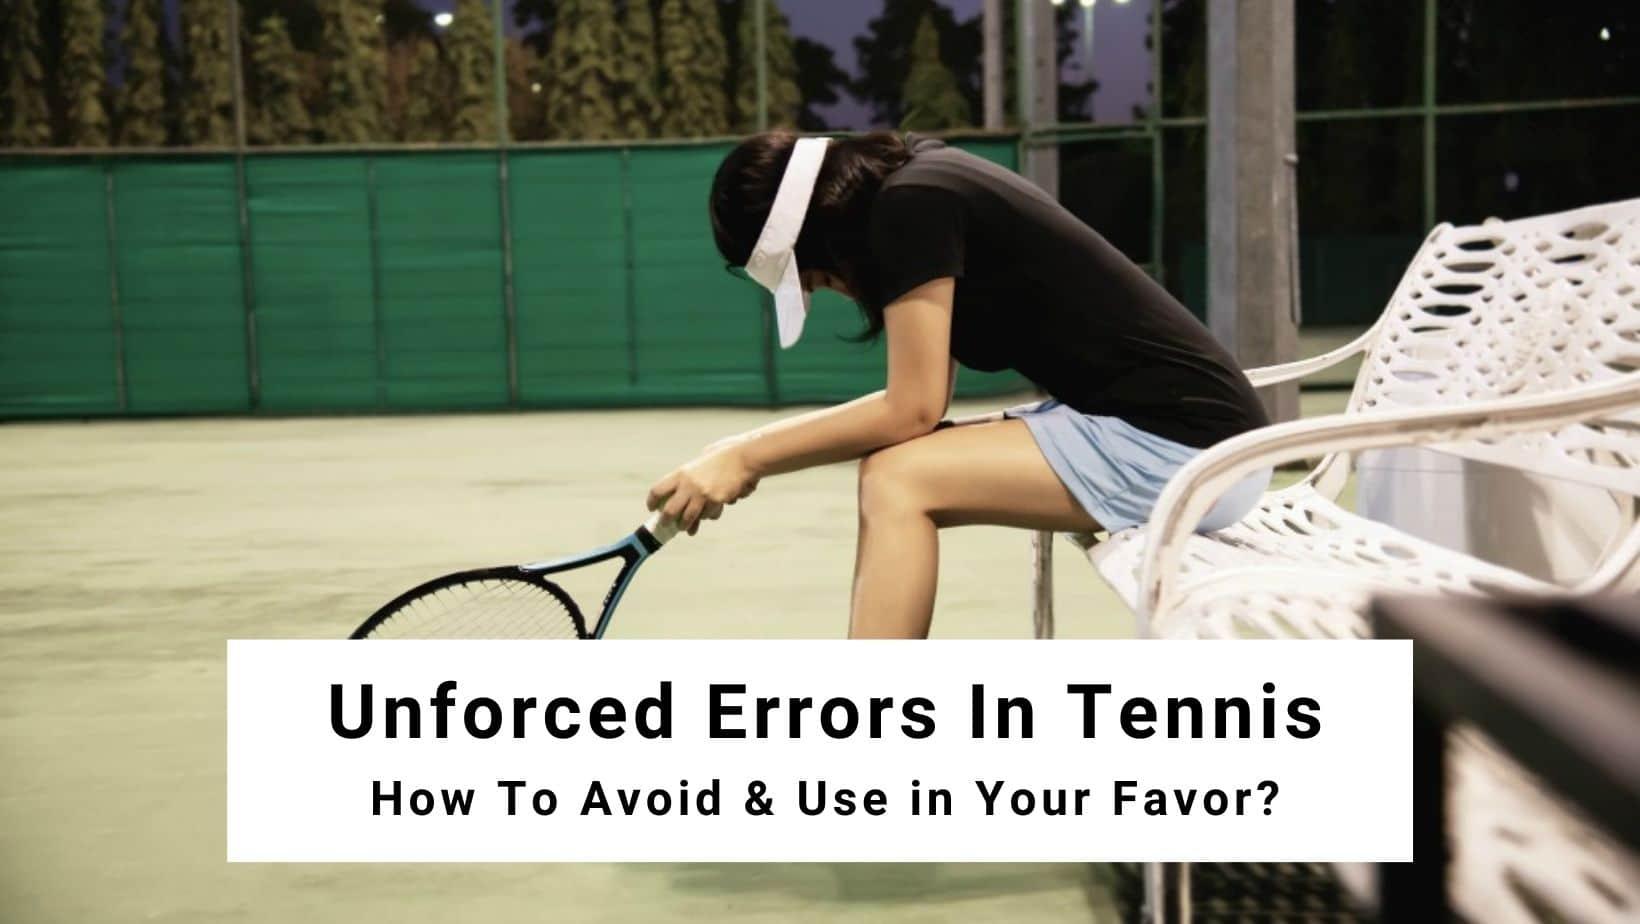 unforced errors in tennis